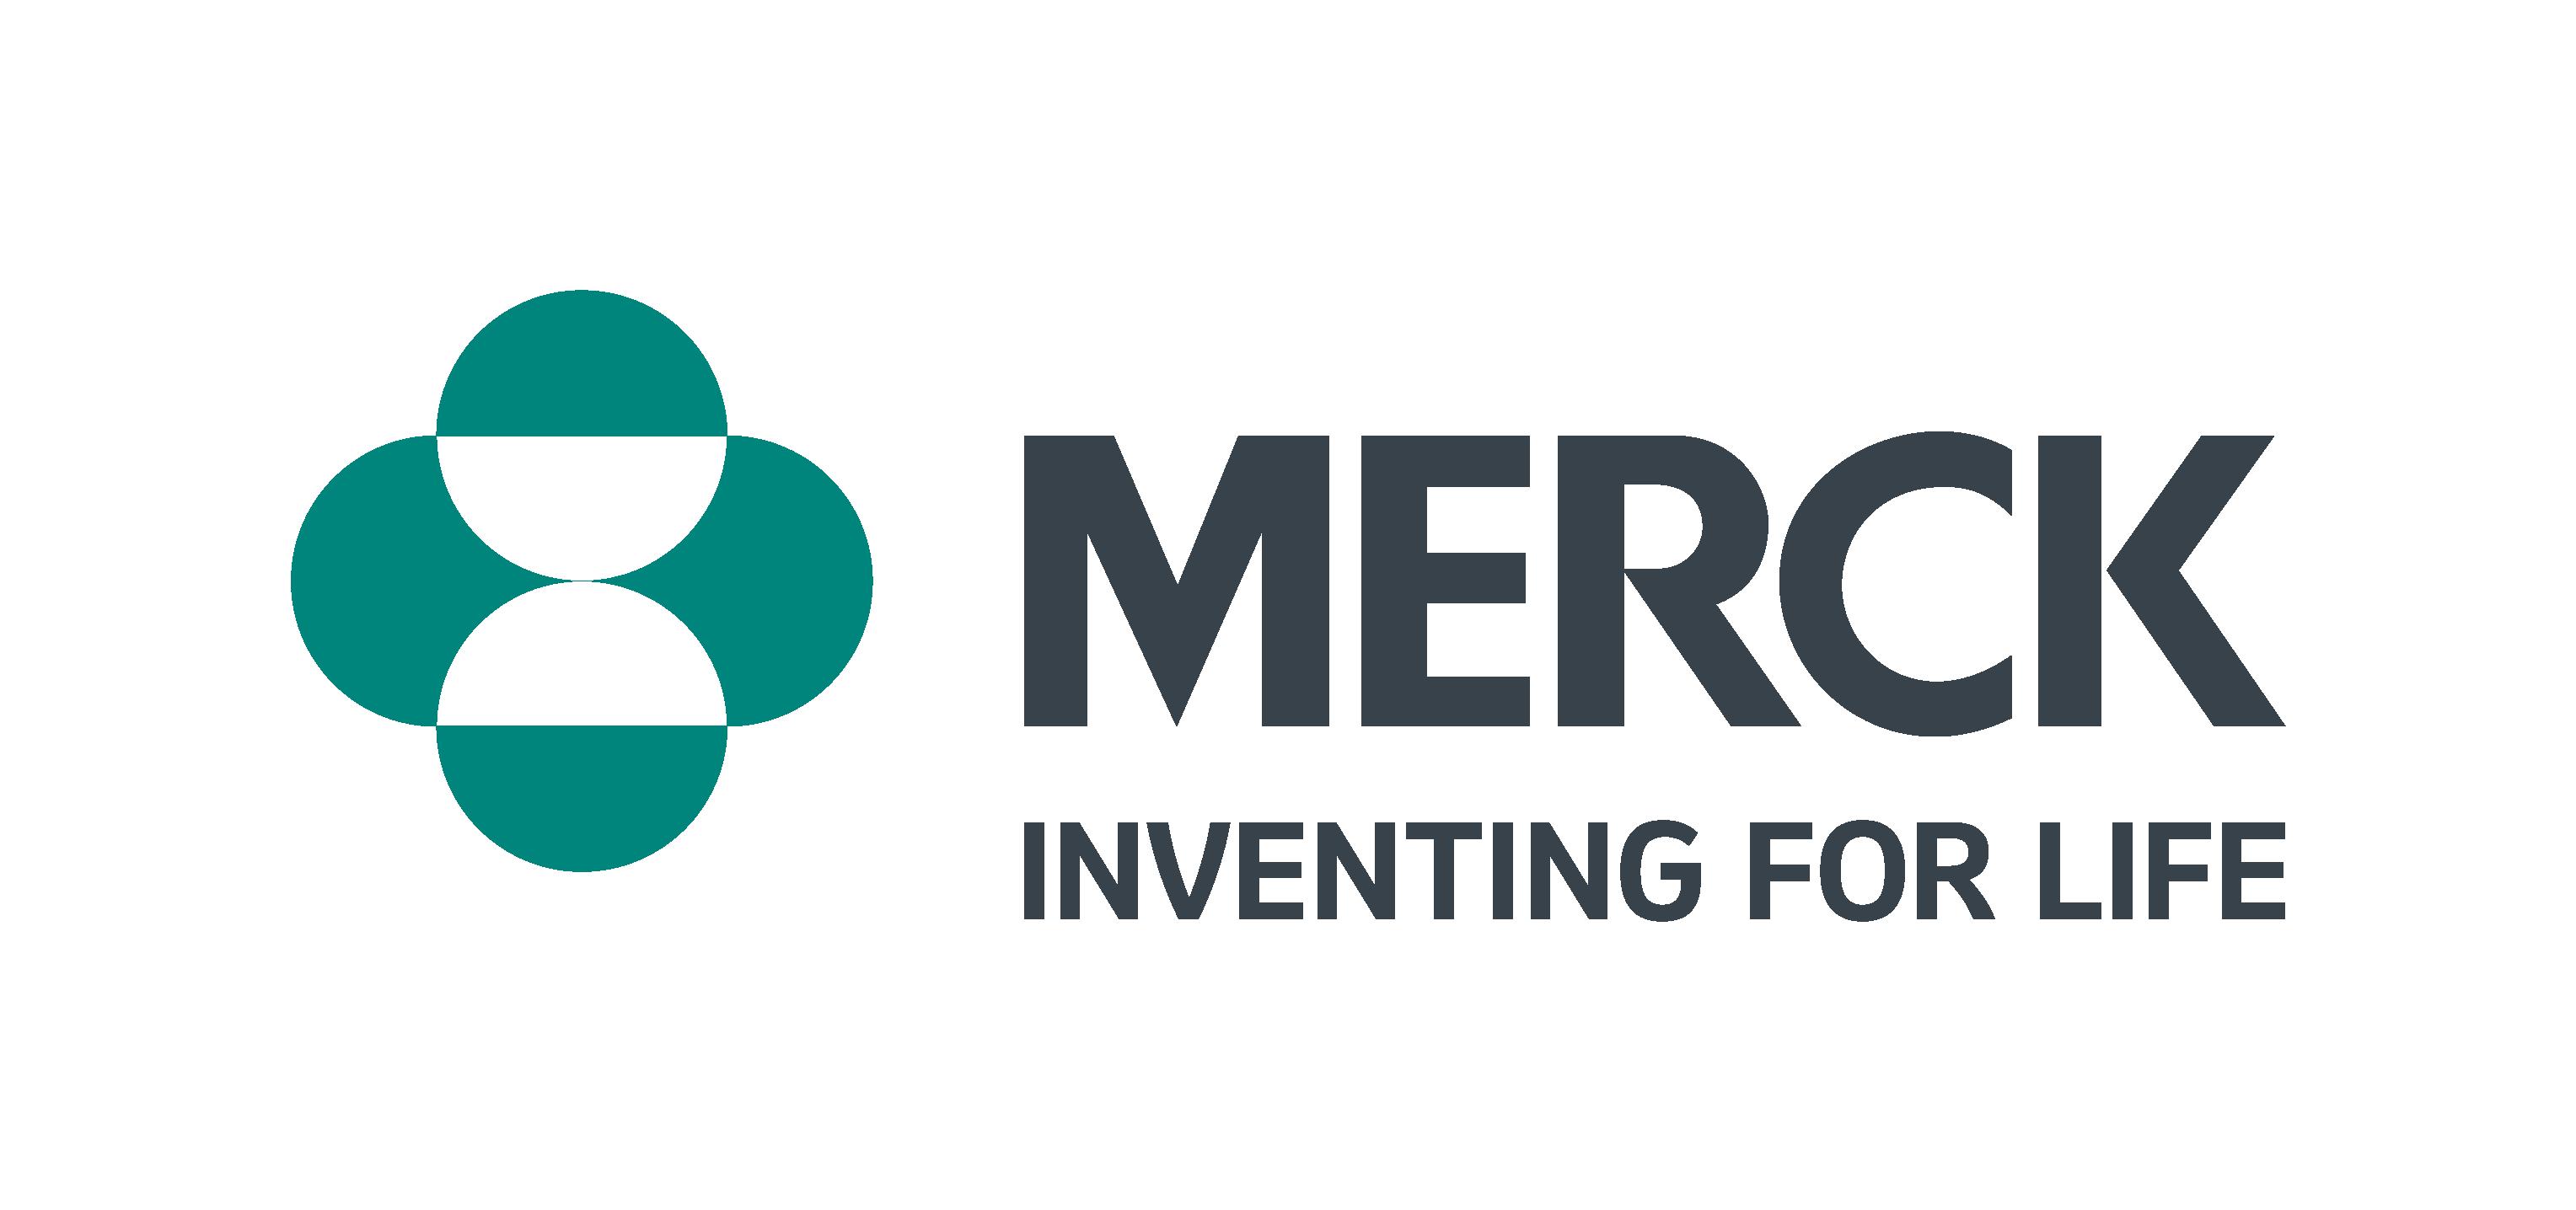 www.merck.com